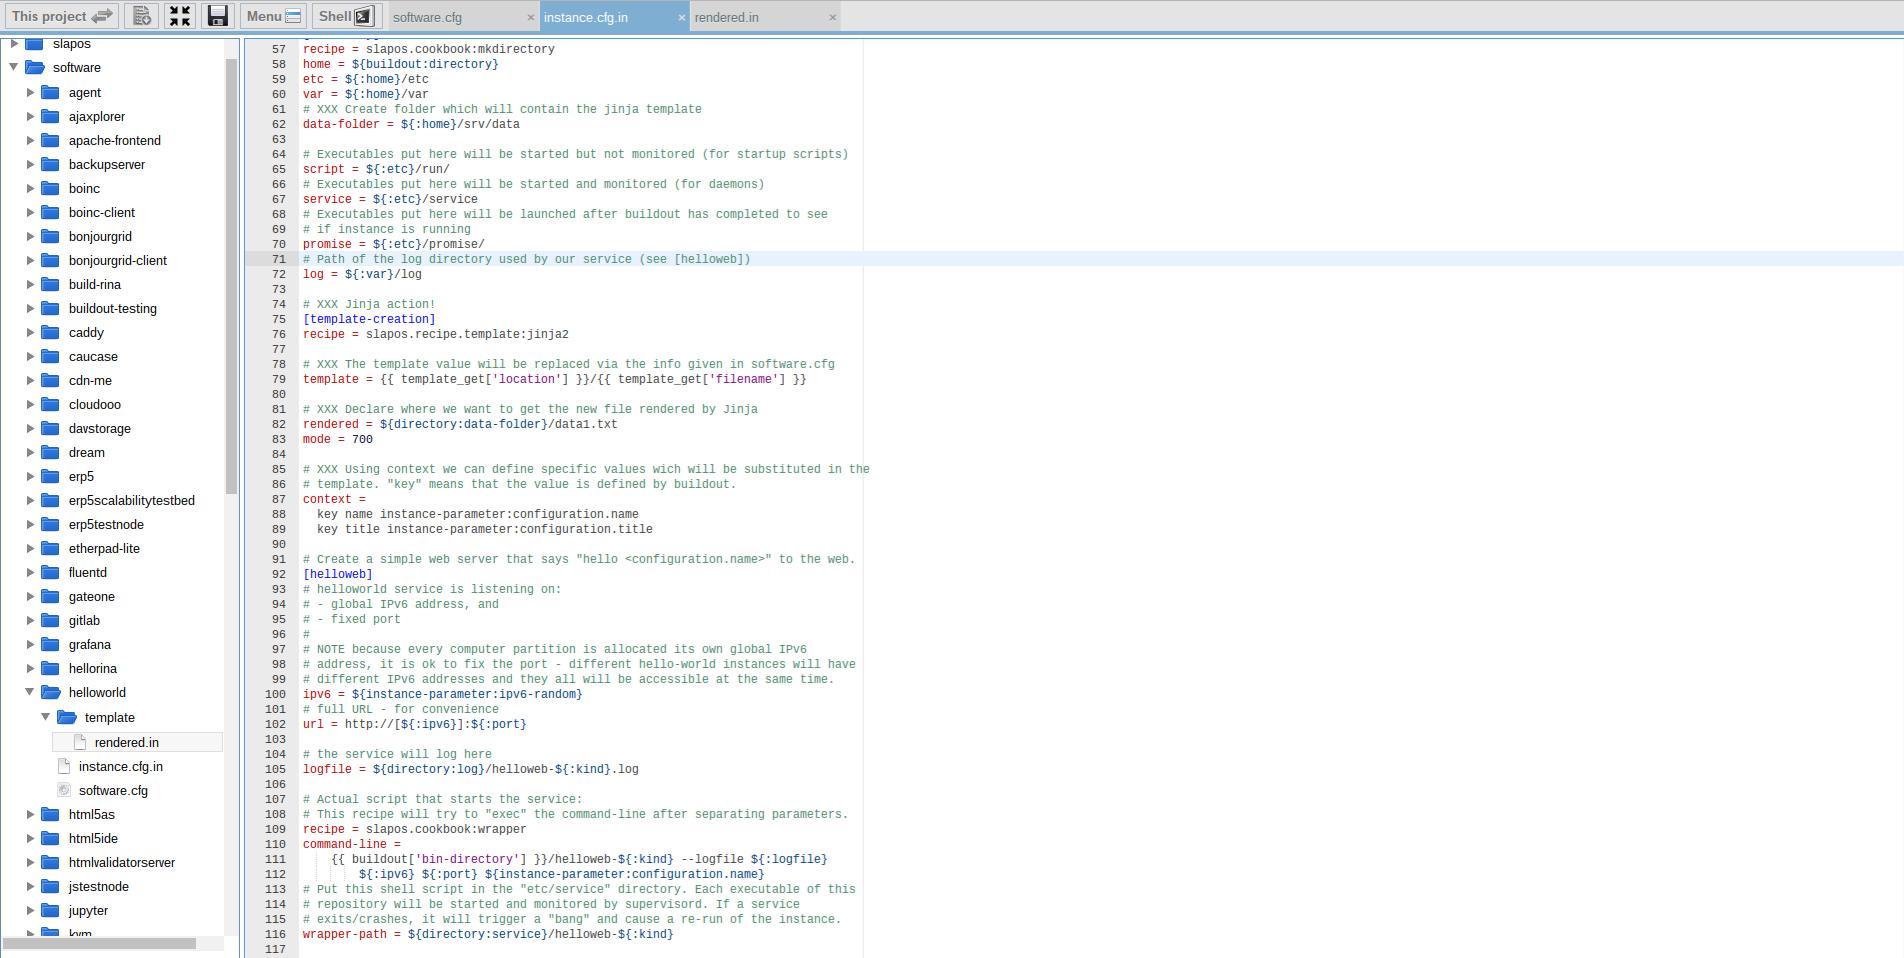 Extending Software Release - Webrunner Interface - Add Template to Instance Profile